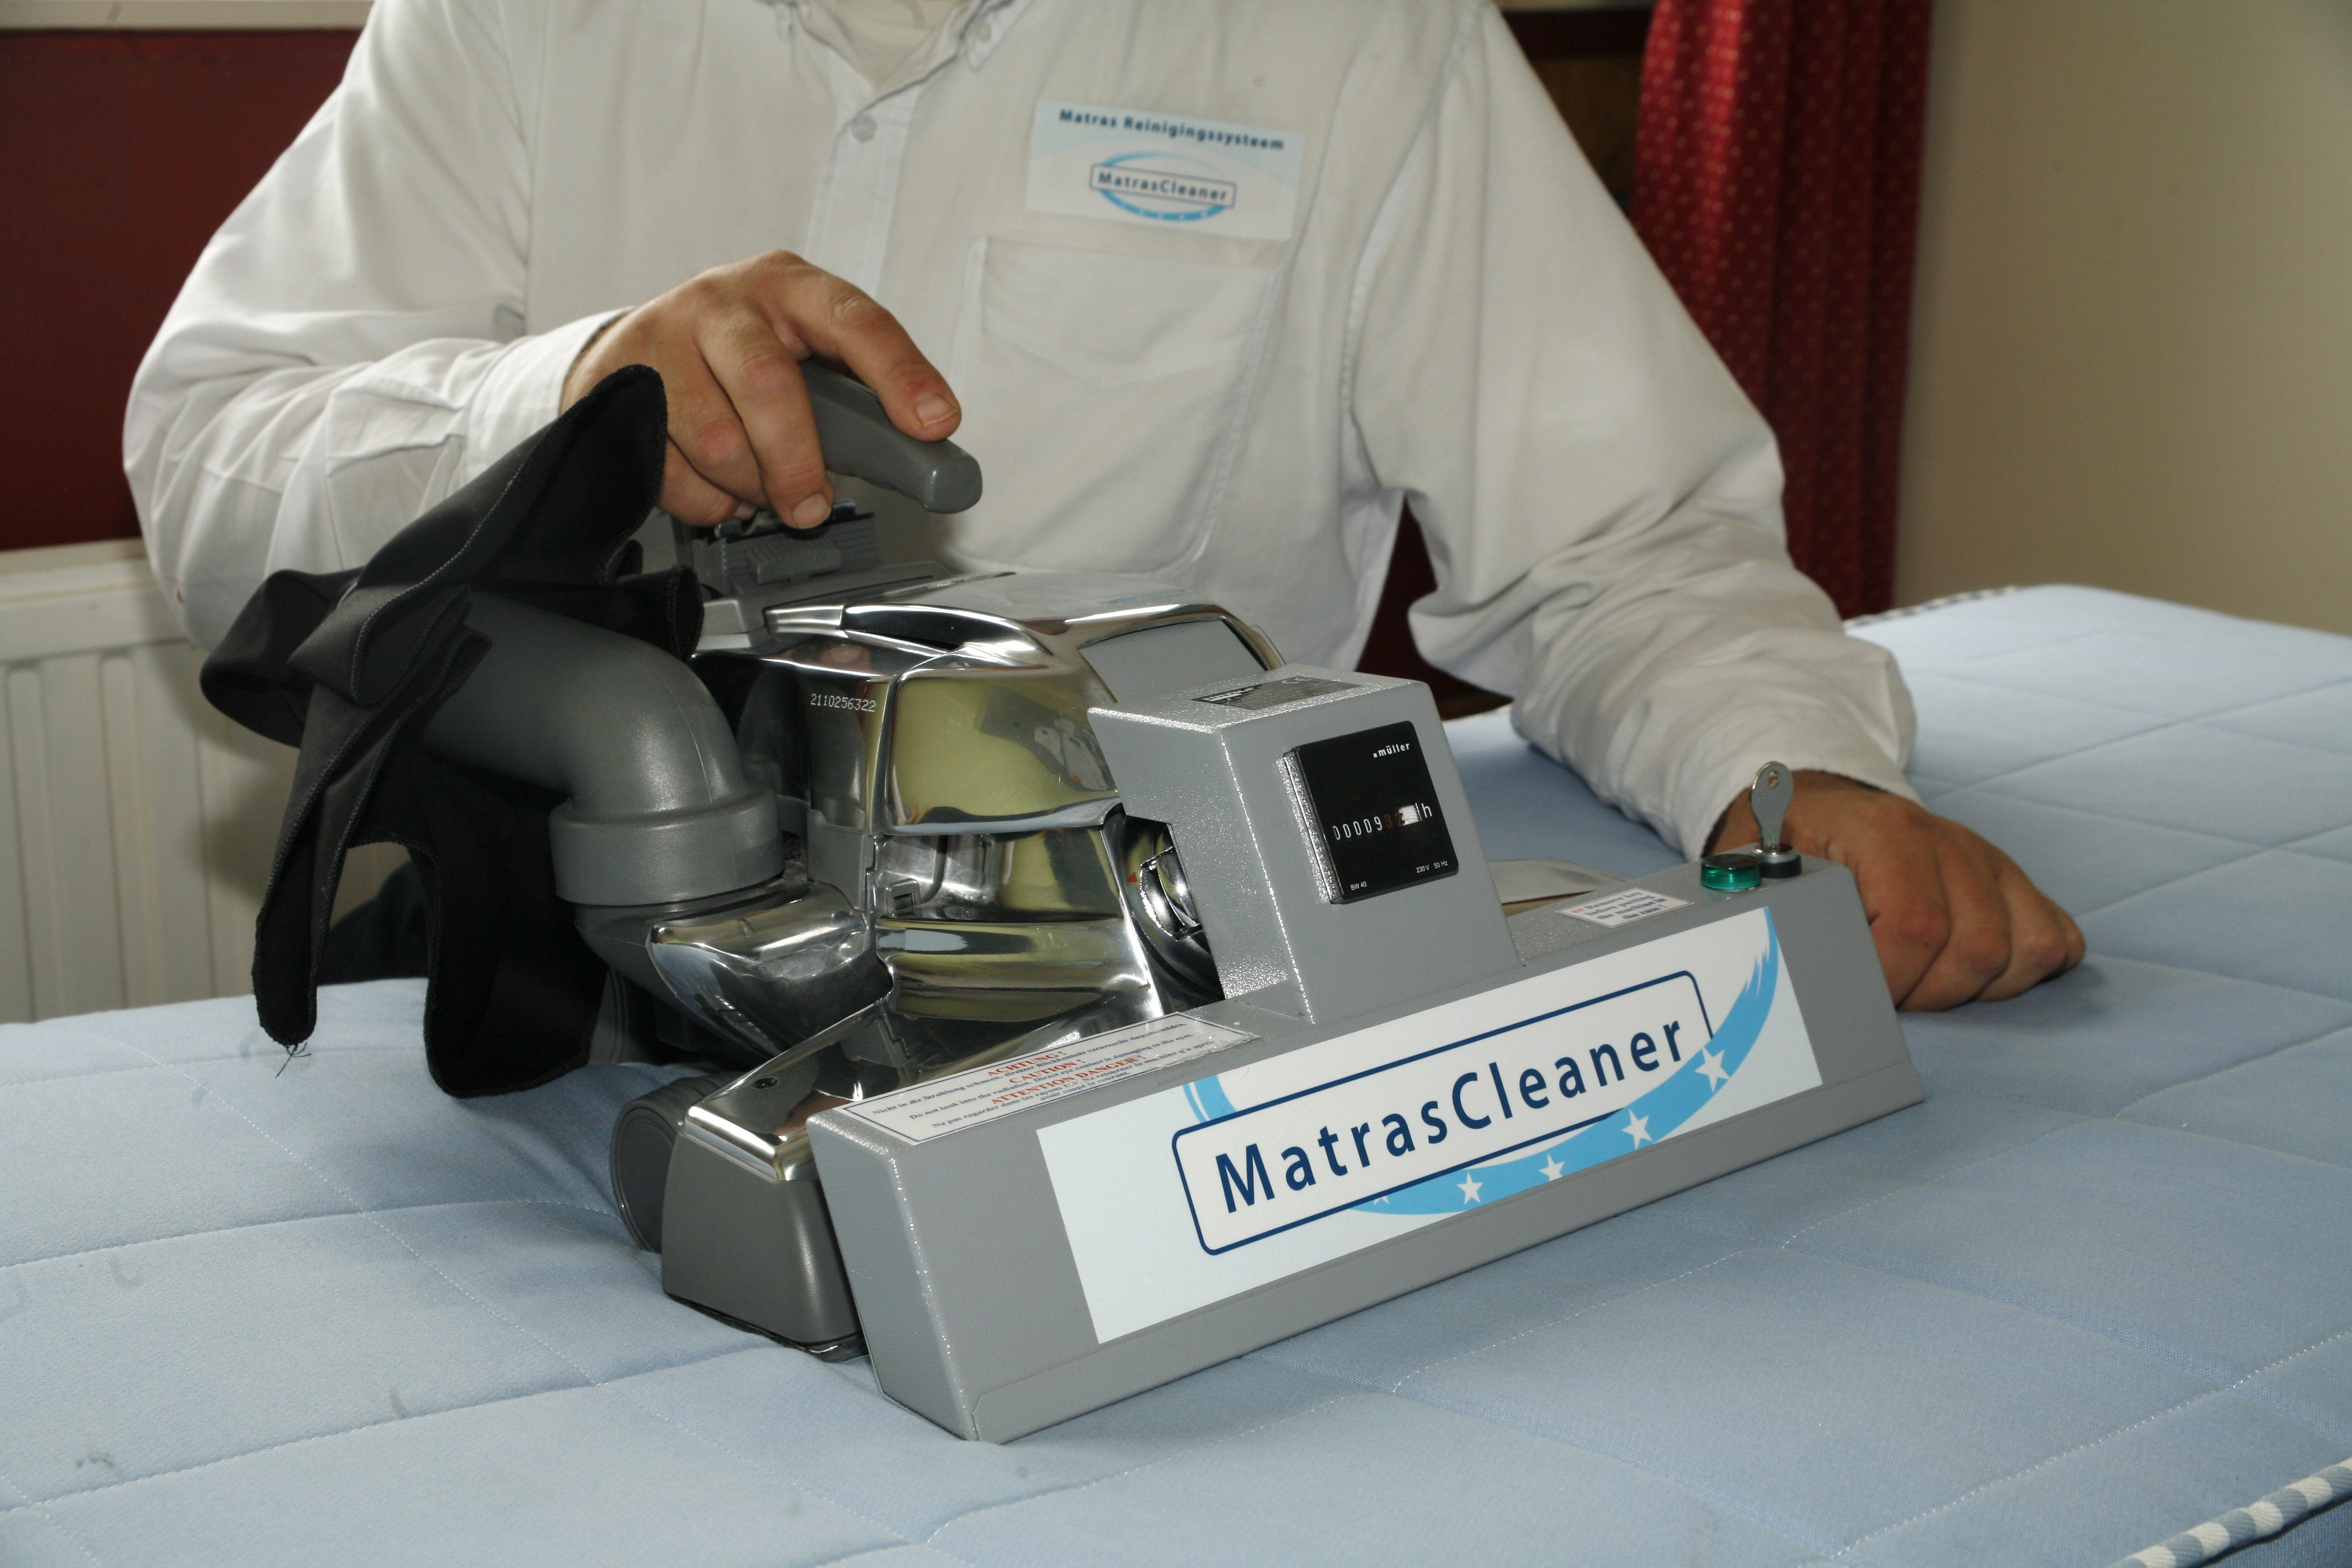 Matras Laten Reinigen : Romokiev slaaphygiëne beesel limburg matras reiniging